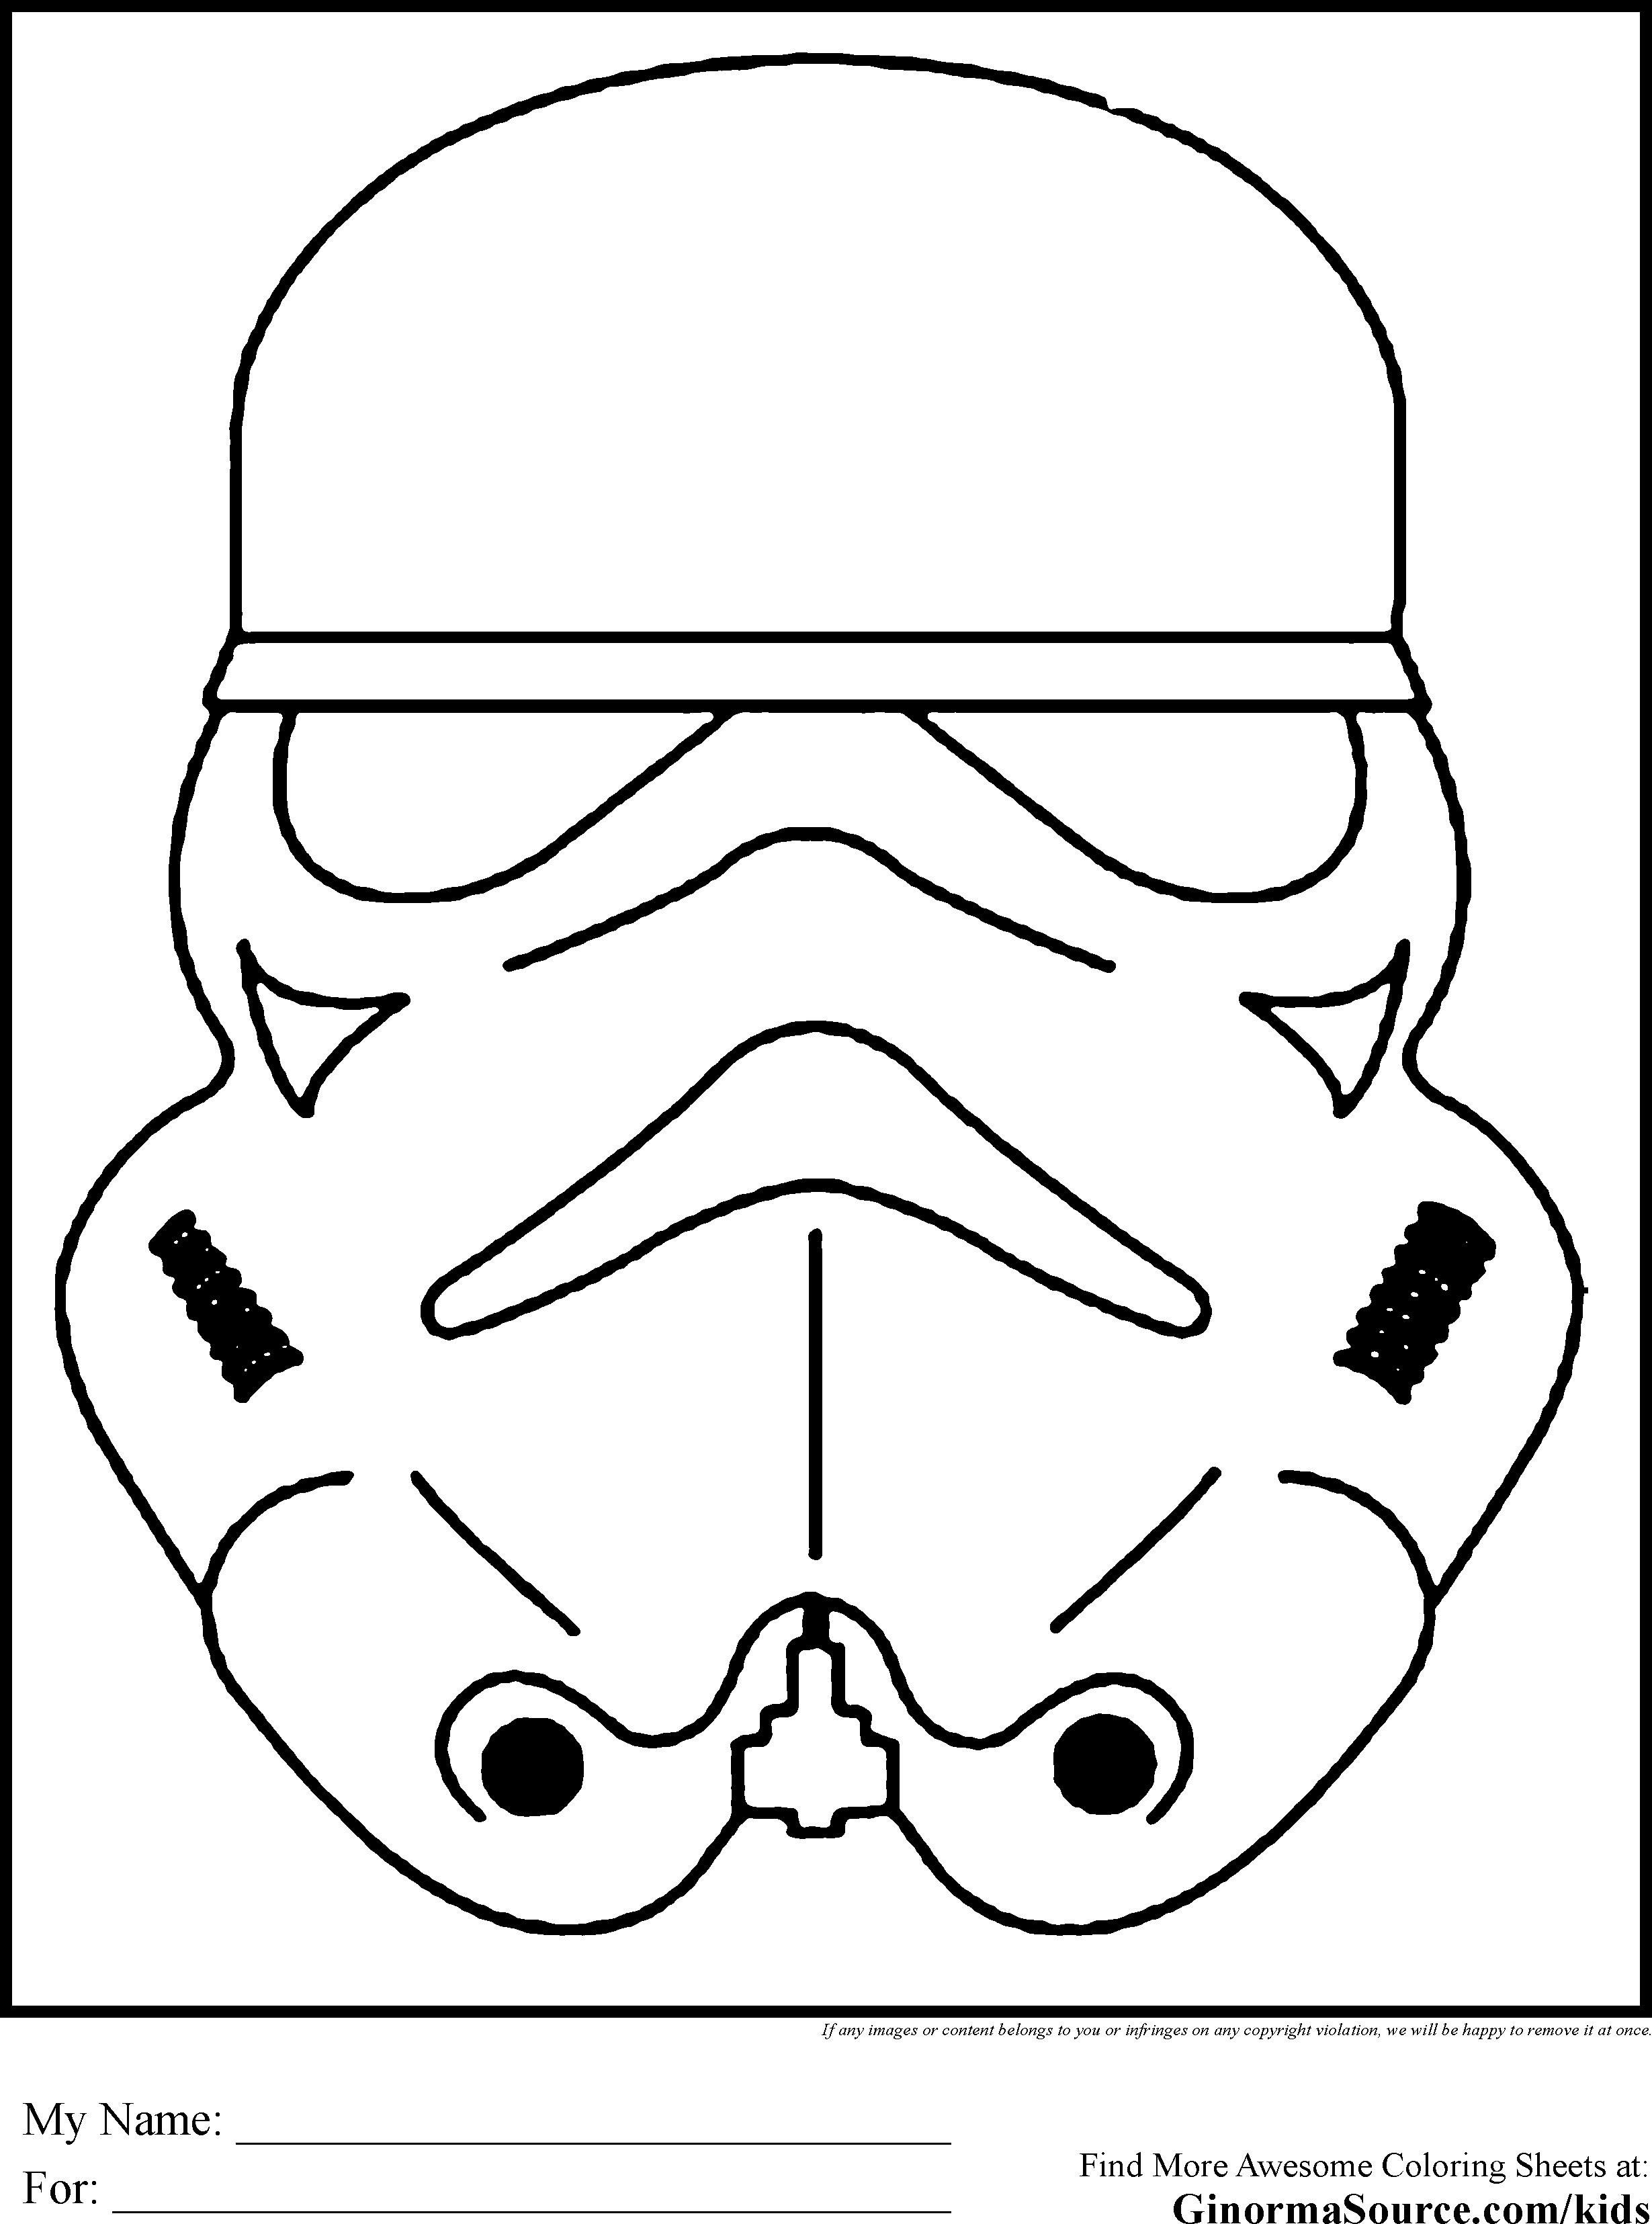 Star Wars clipart mask Wars printable (51+) stormtrooper Wars